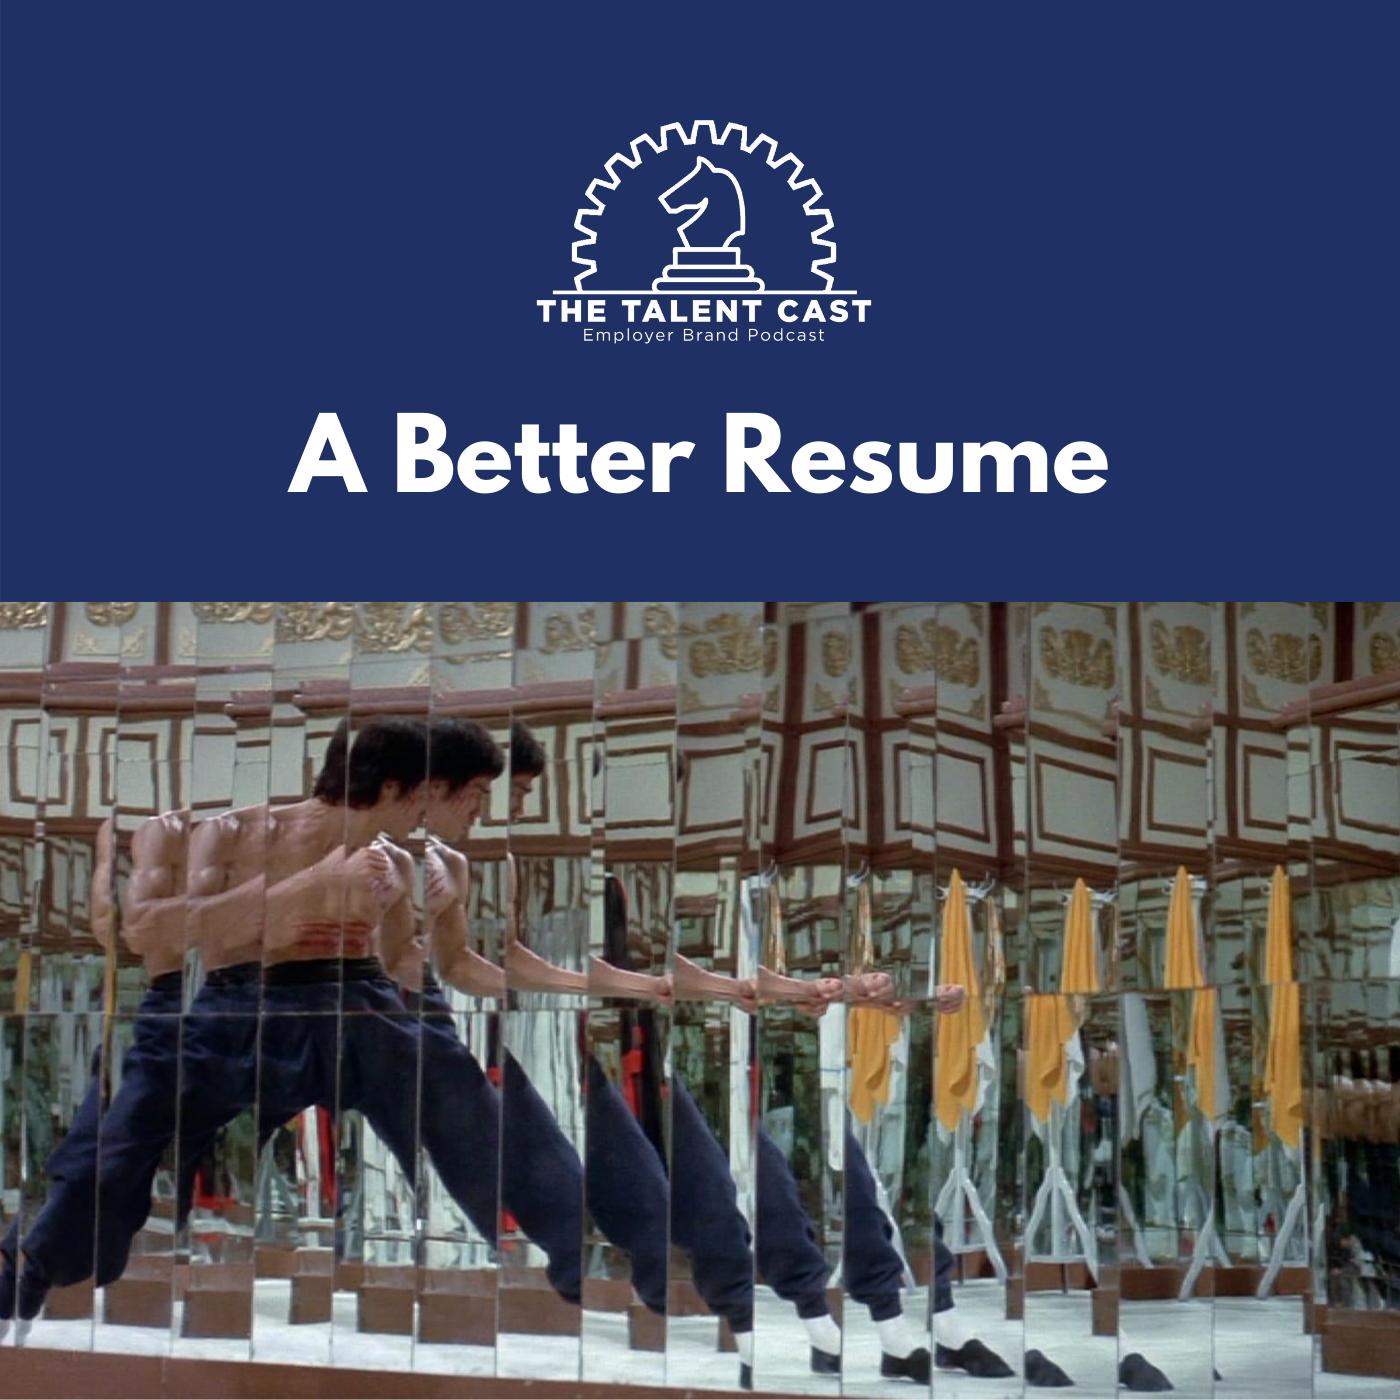 A Better Resume